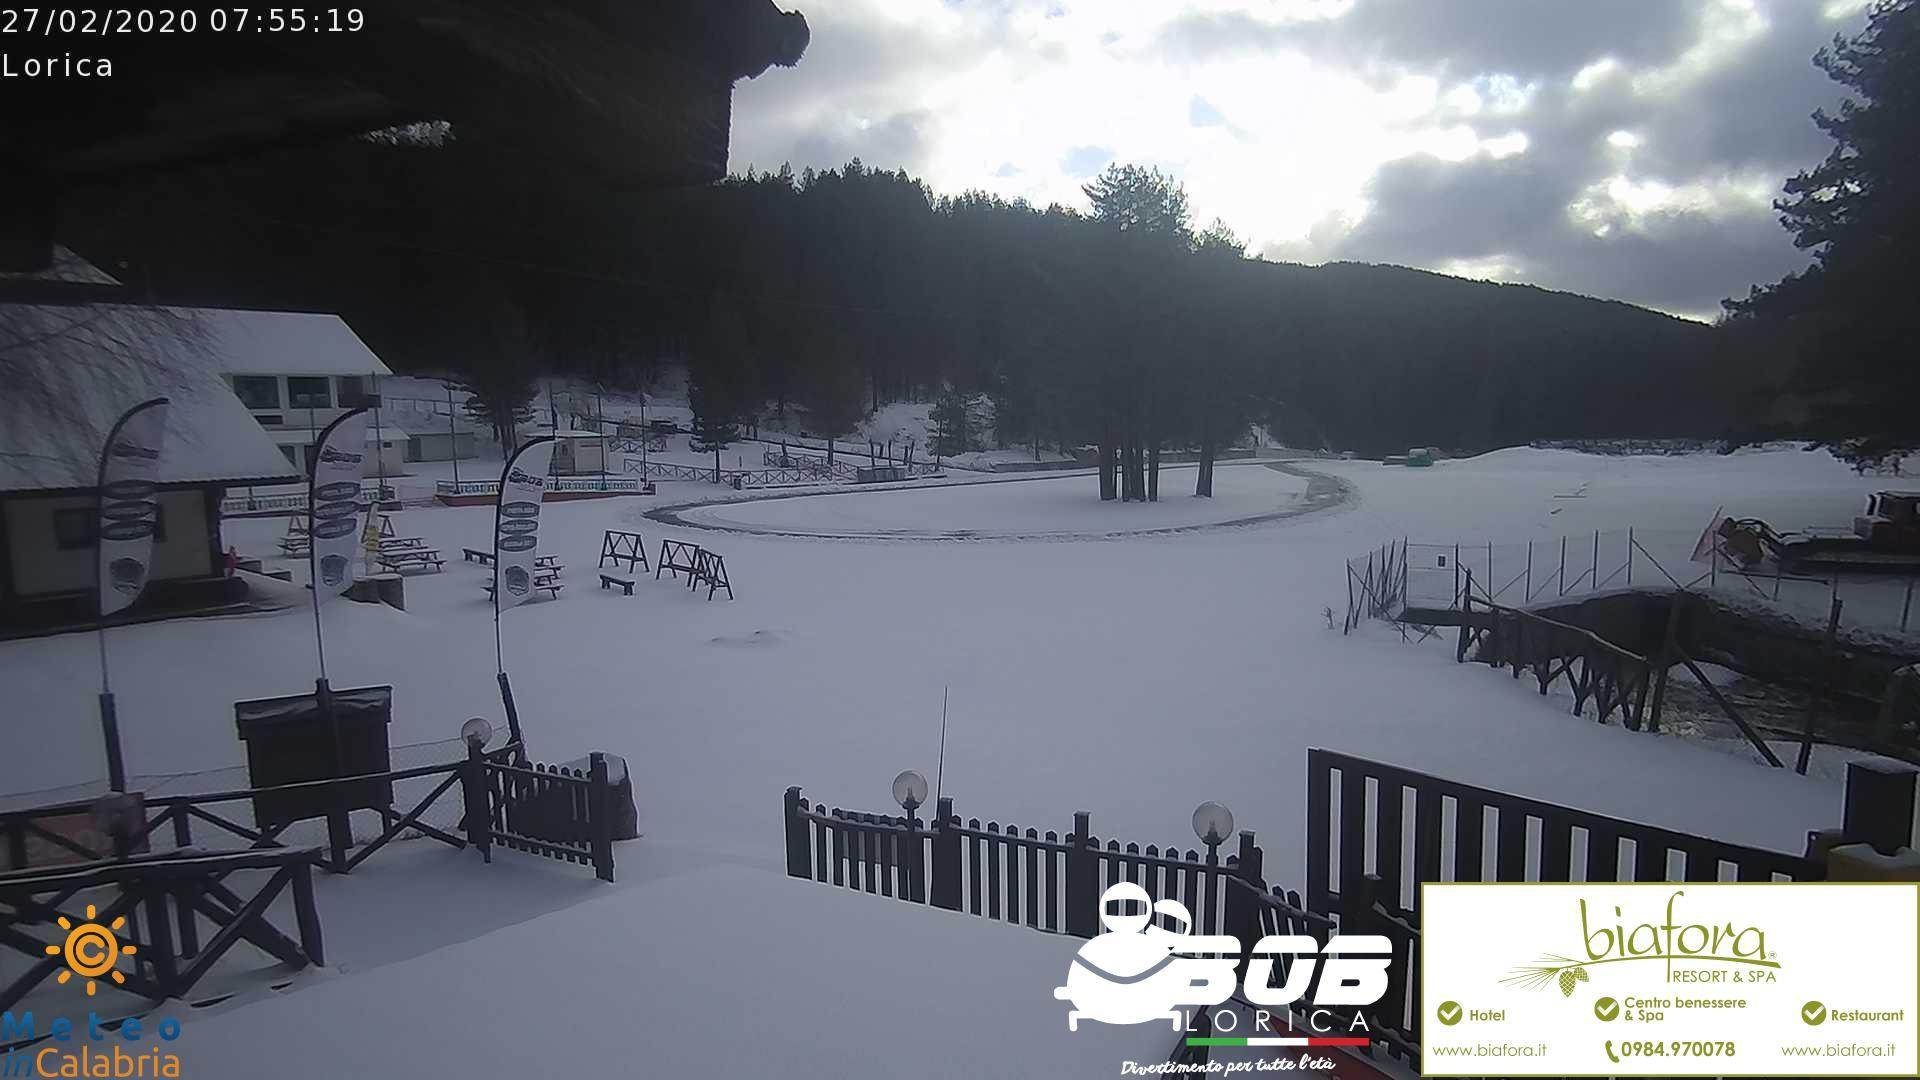 lorica neve 27 febbraio 2020